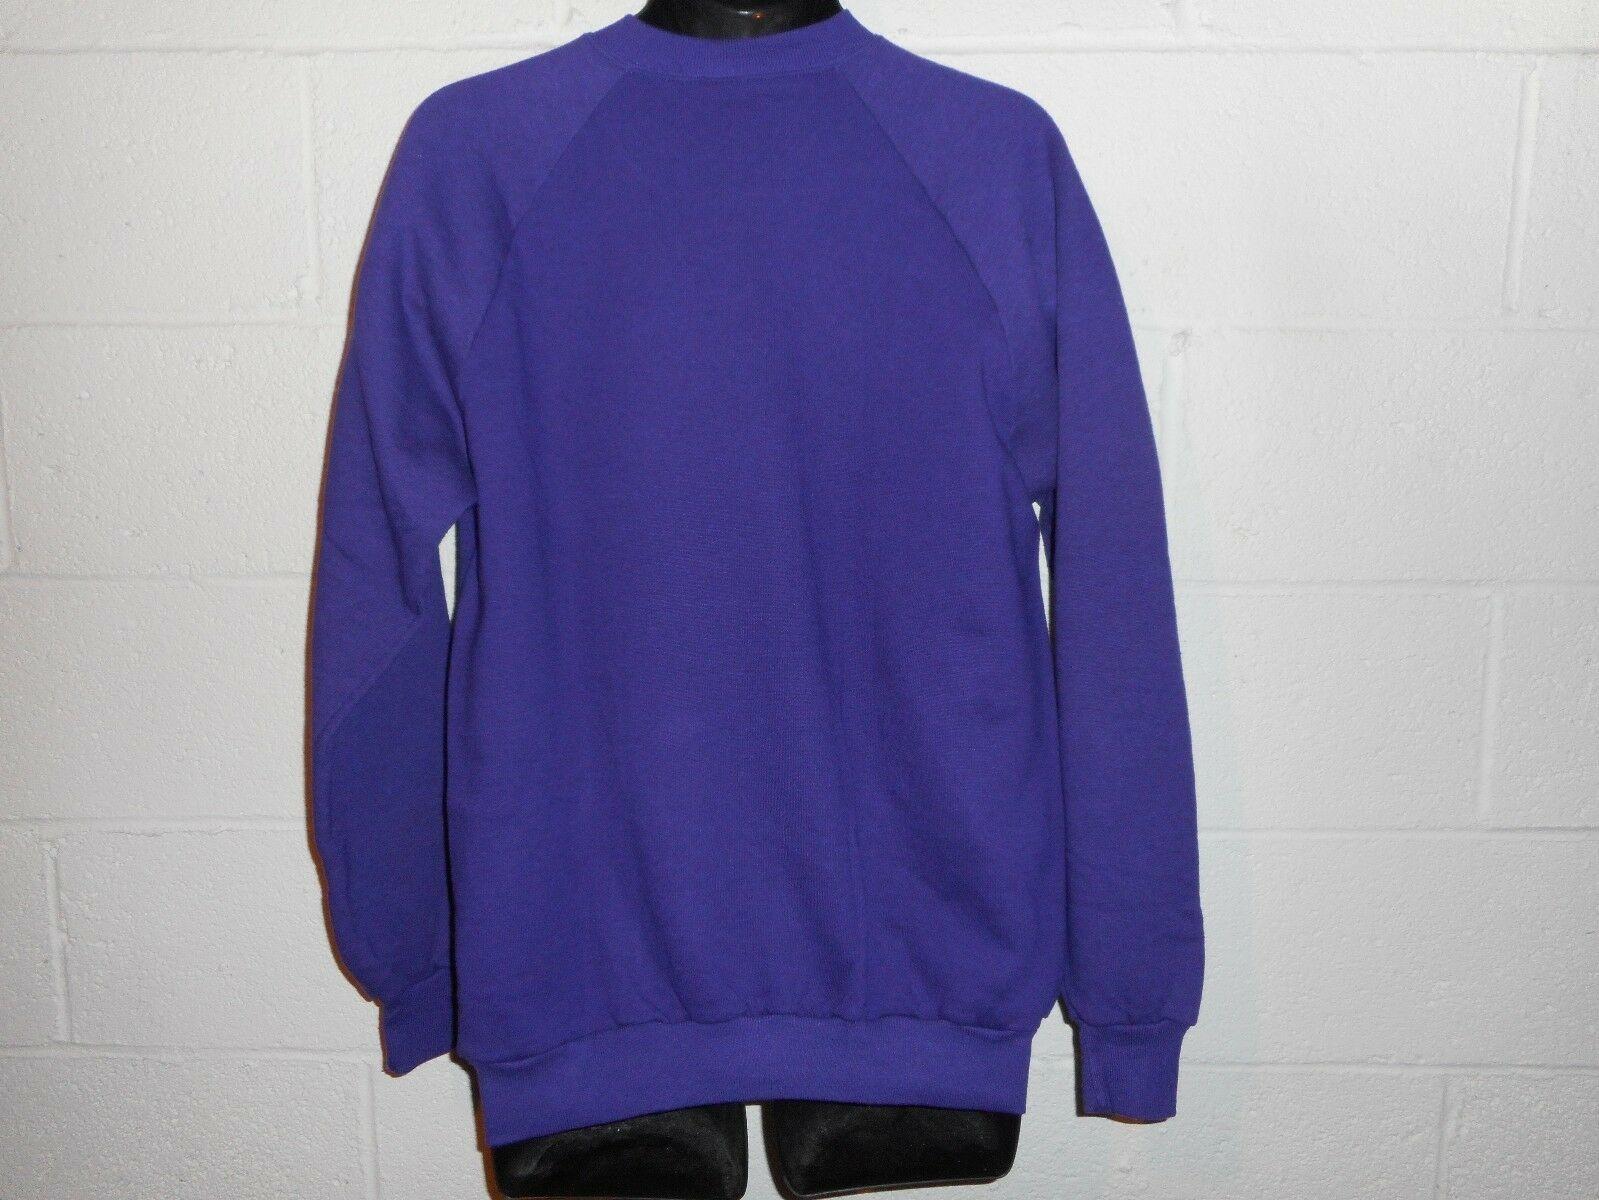 Vintage Topsy Turvy 80s Girl Purple Gold Sweatshirt XL